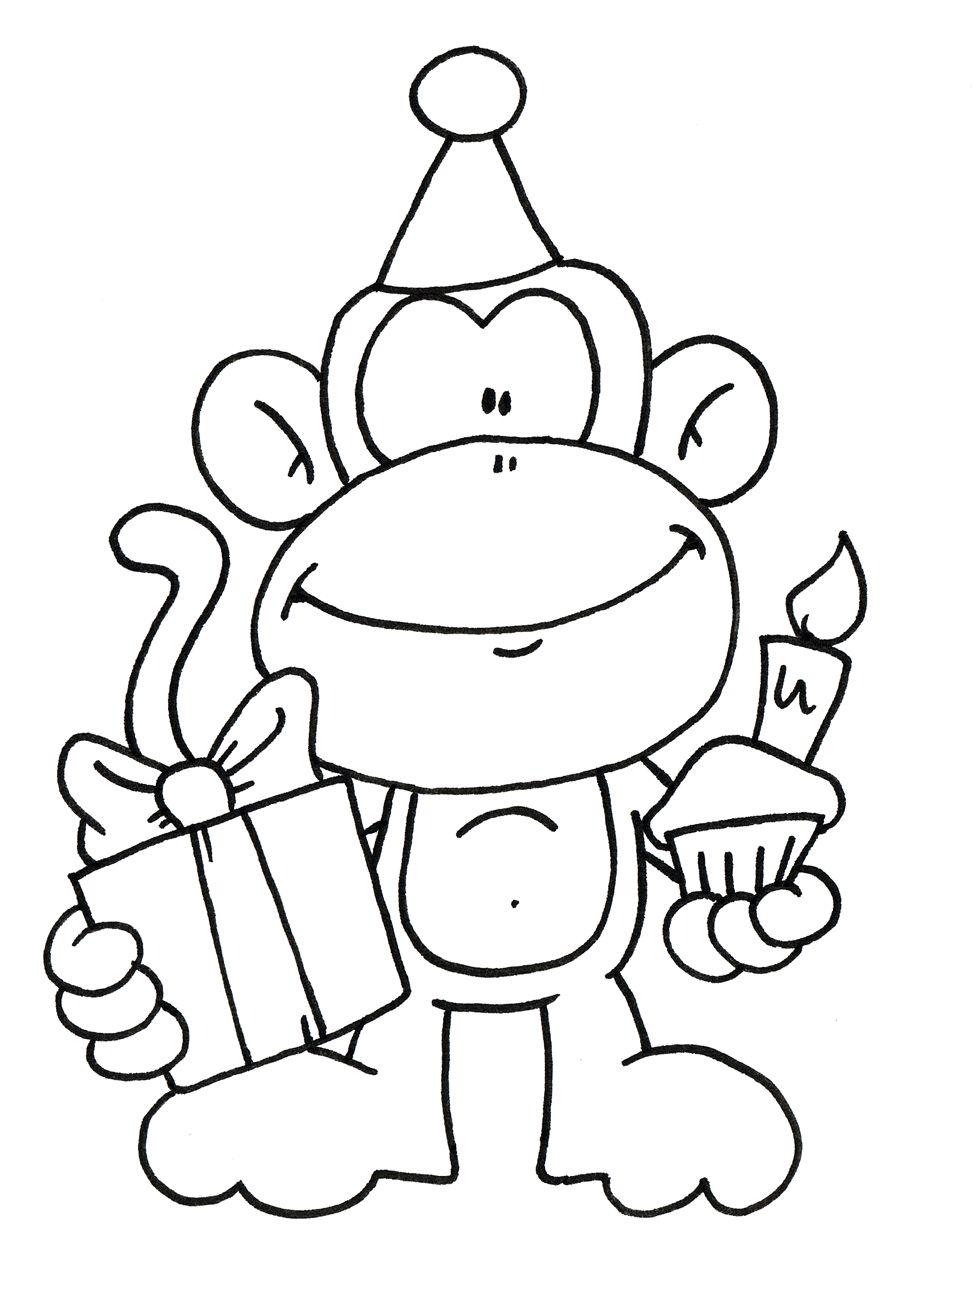 Free Birthday Digi Stamps Clipart - Free Clipart | Digi ...